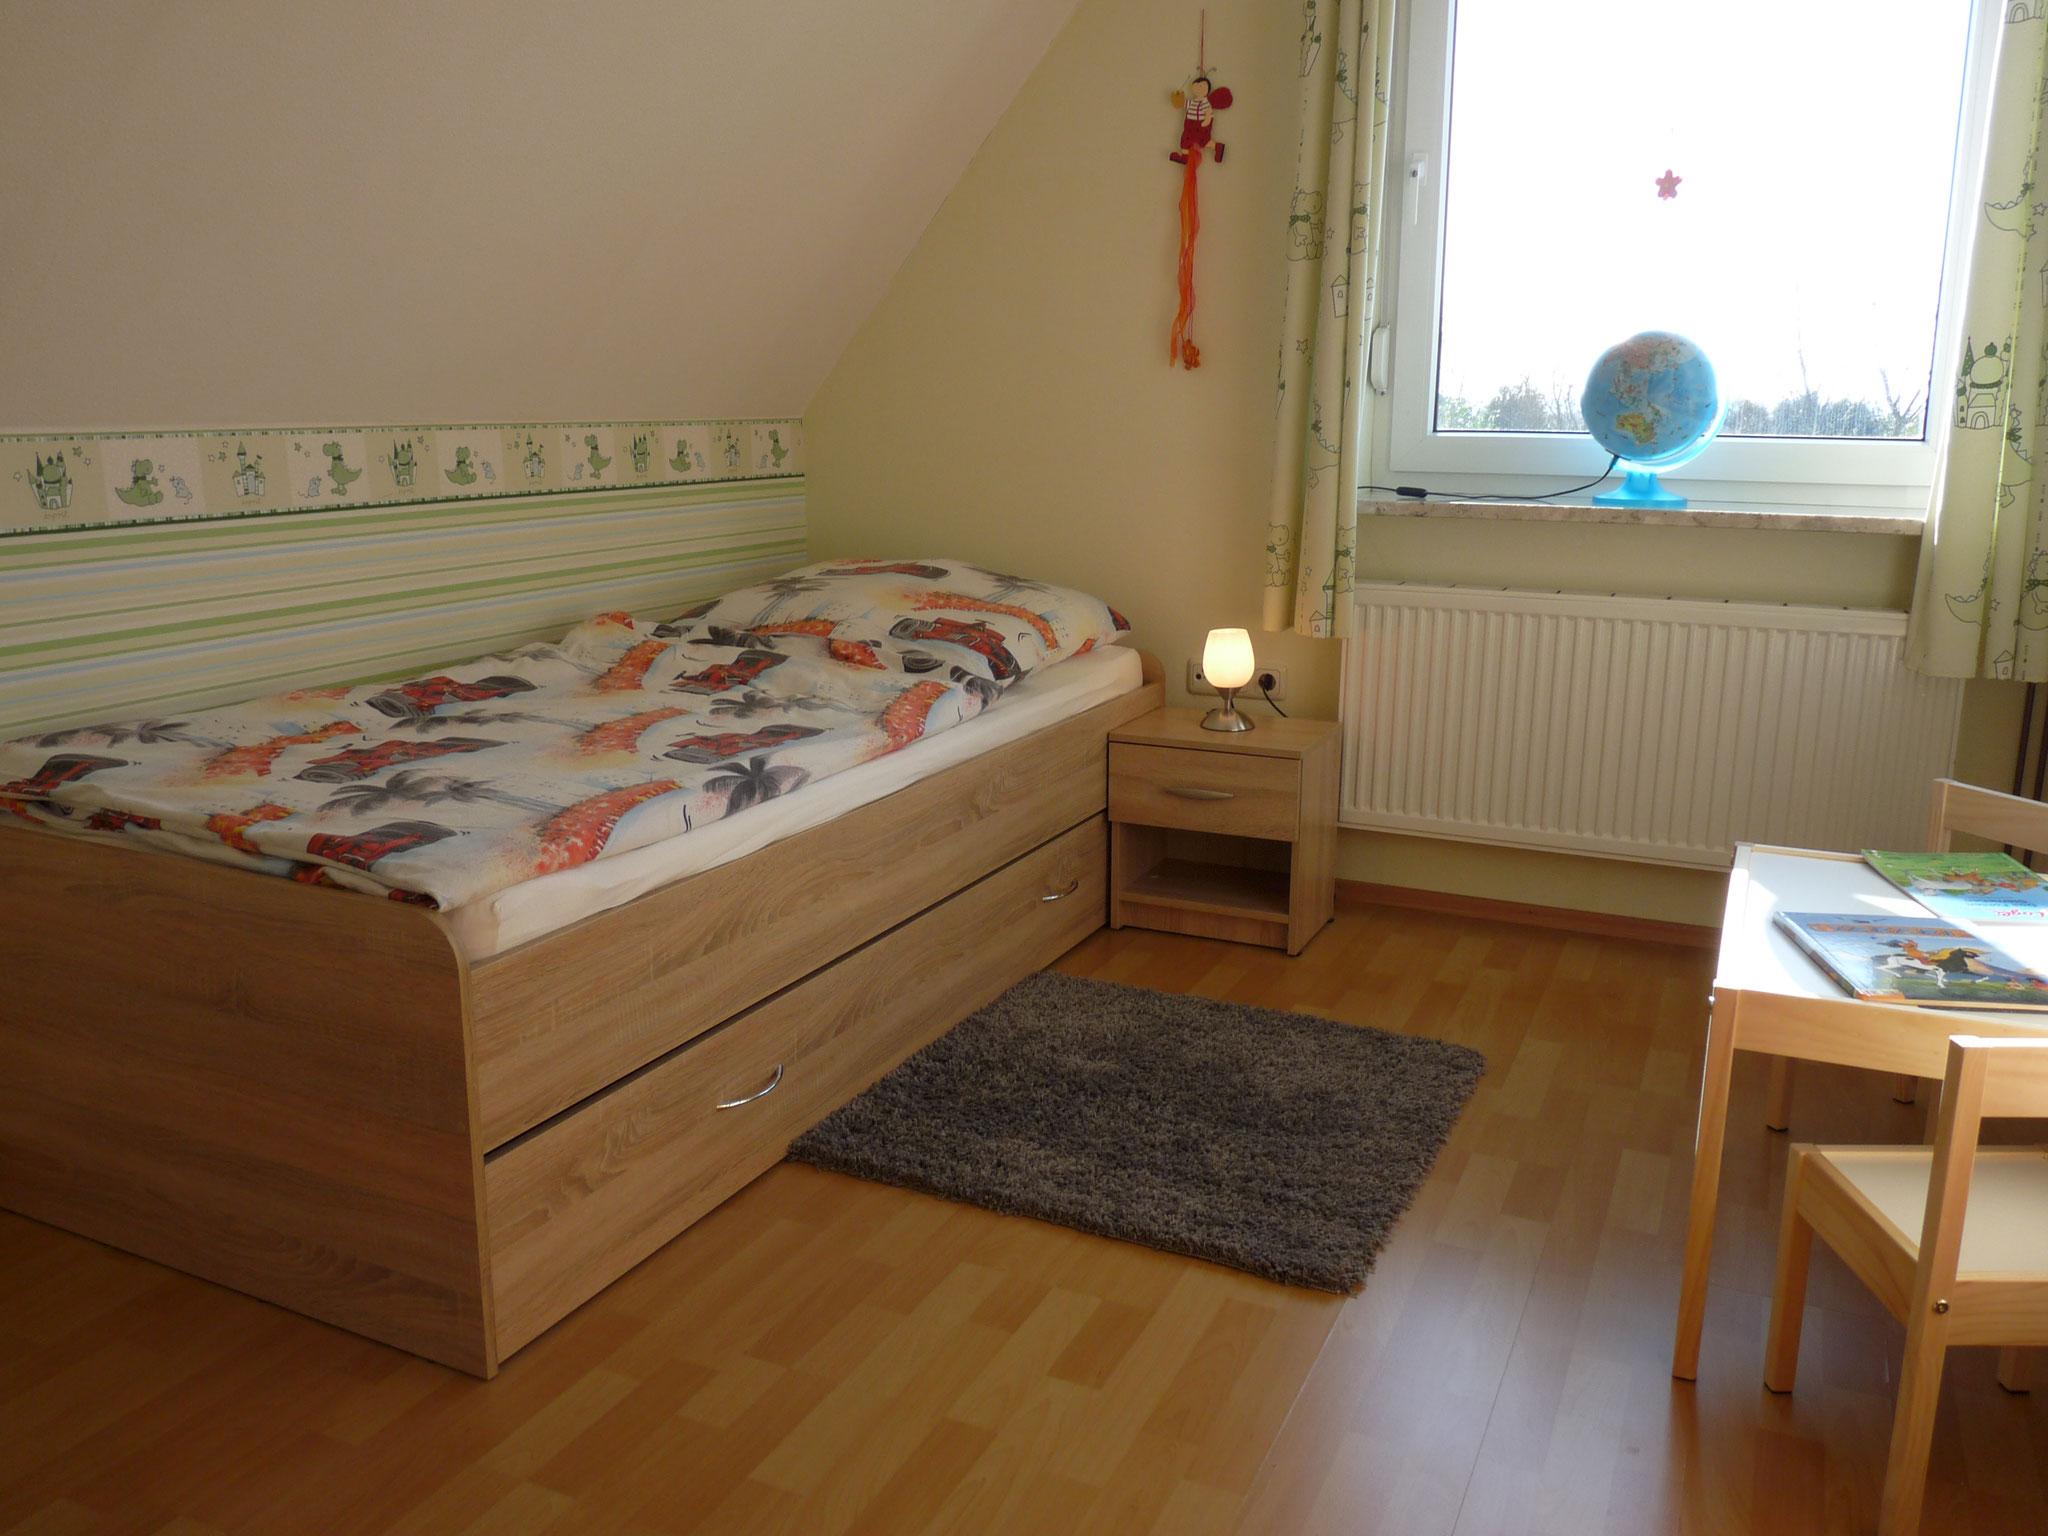 OG Schlaffzimmer 3 (90cm x 200cm)